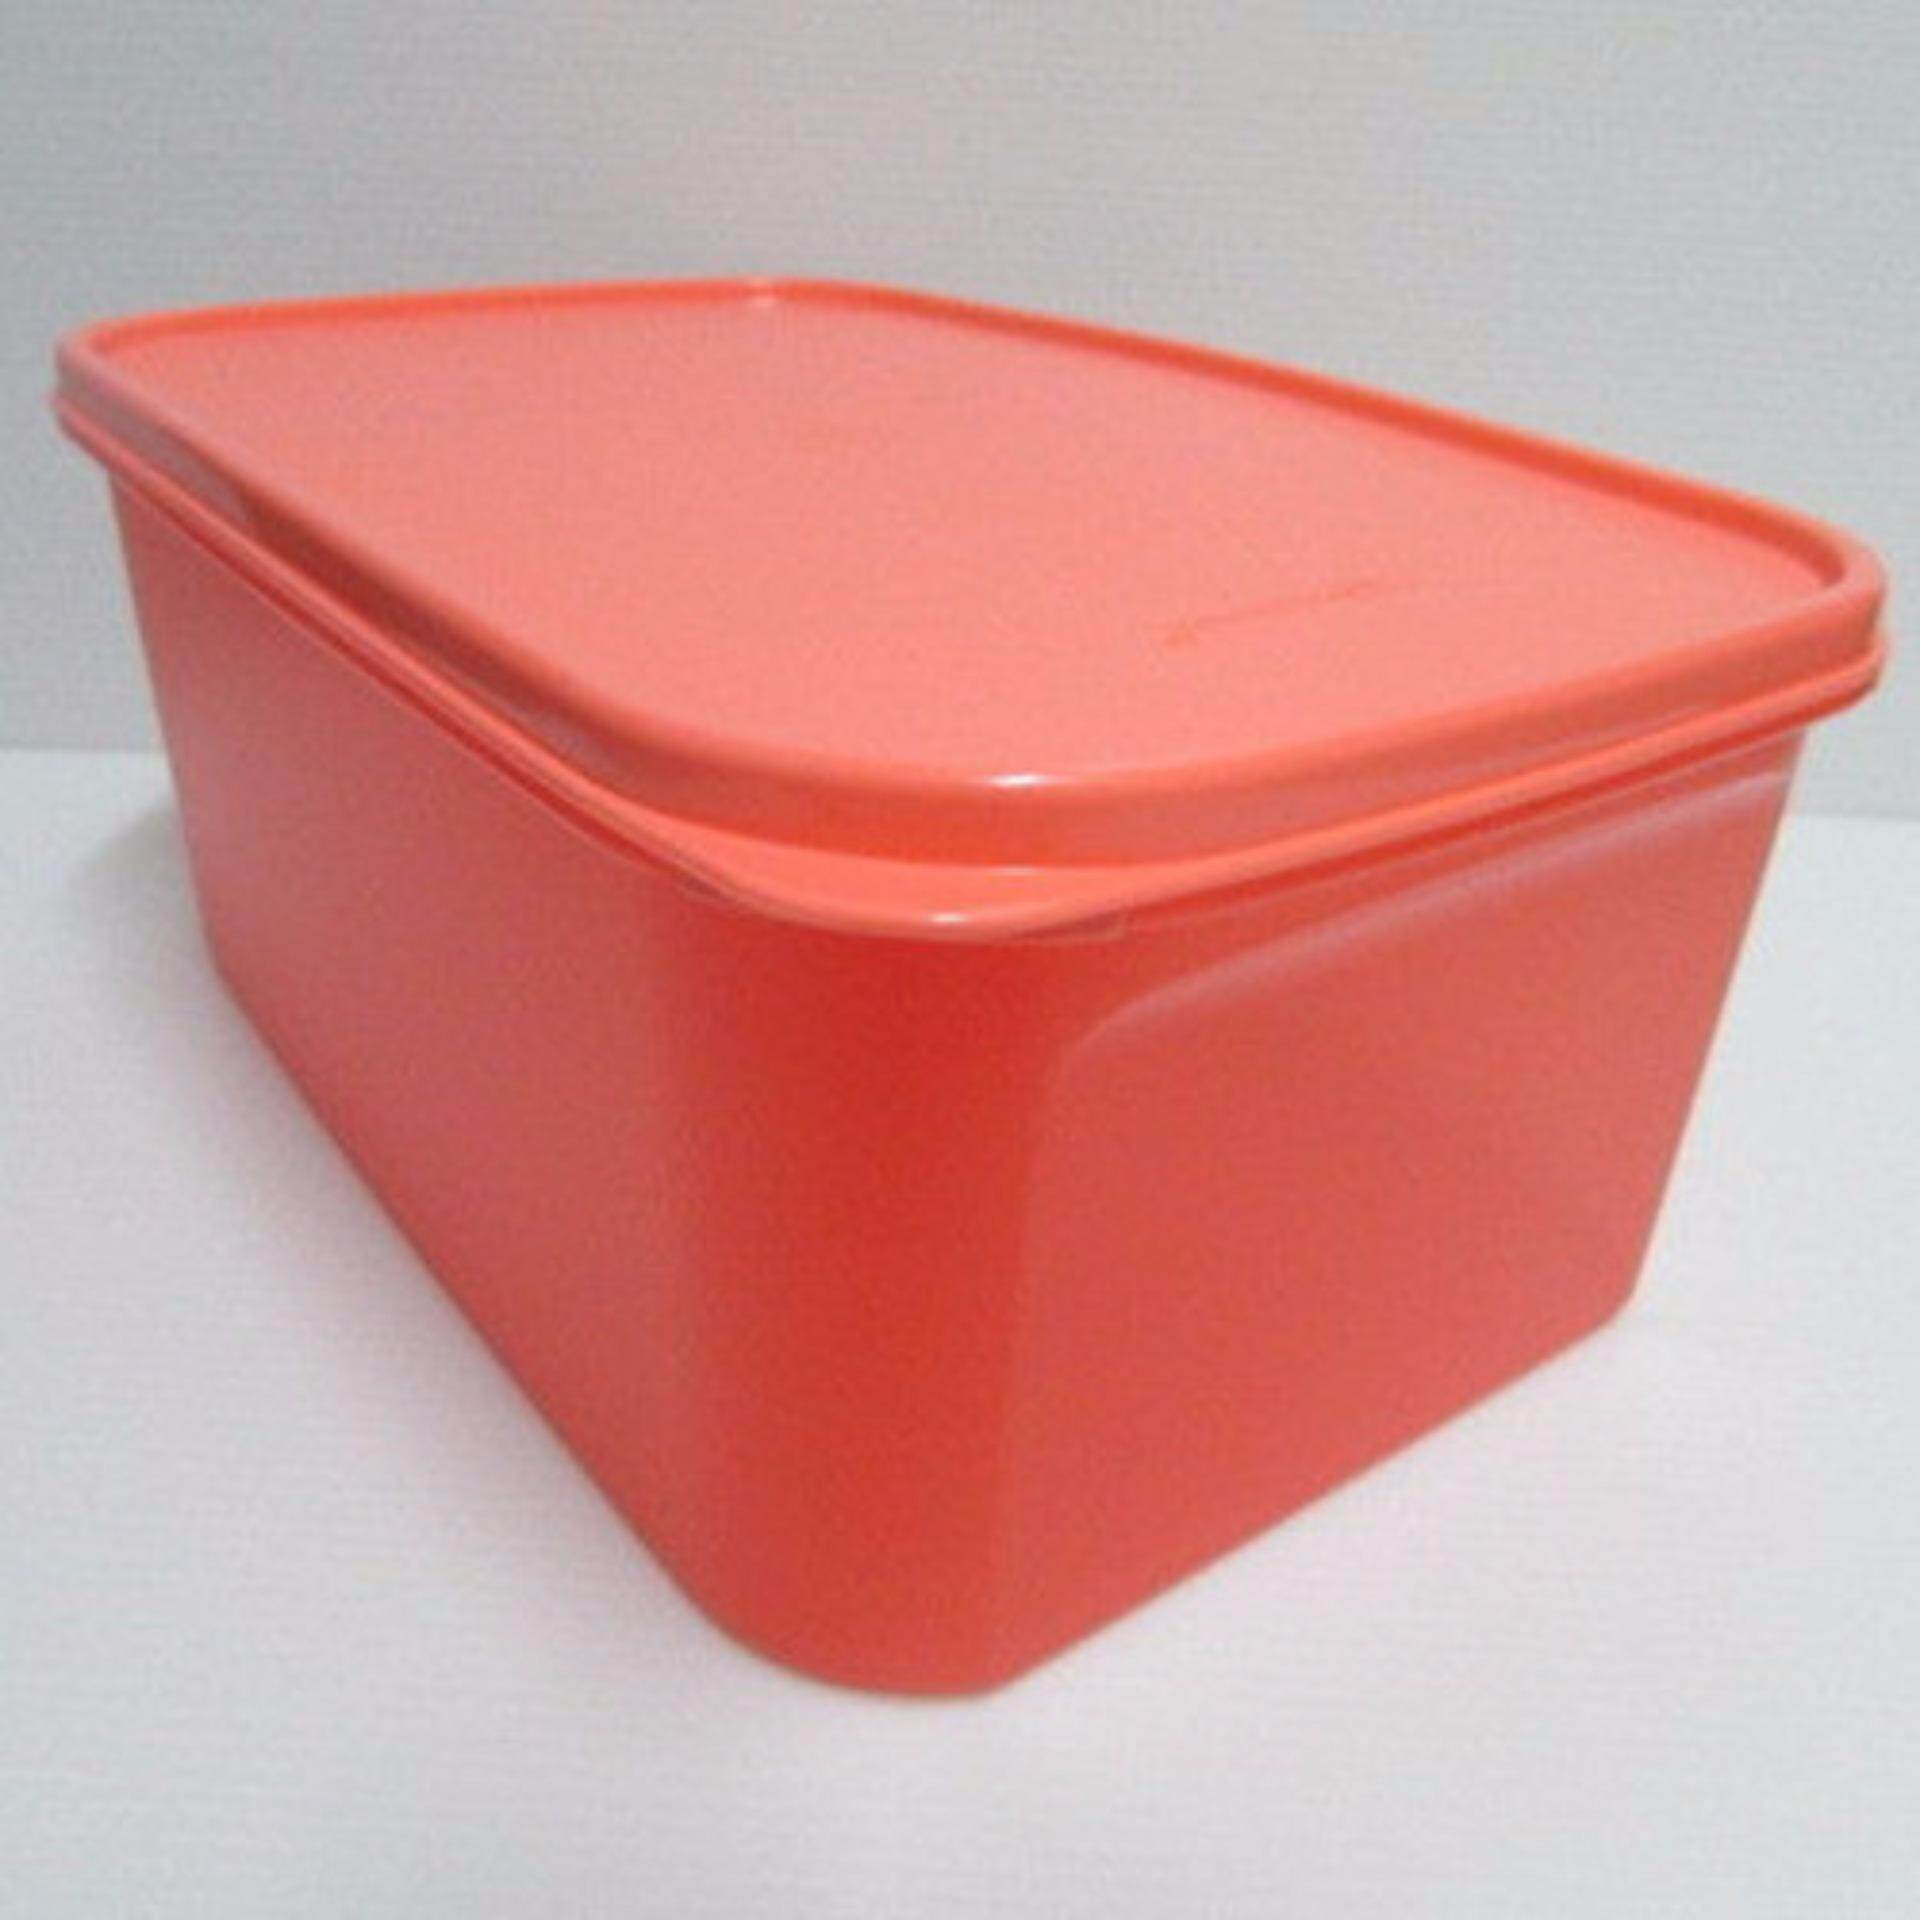 Tupperware Modular Mates Rectangular II (1) 4.3L - Melon Red